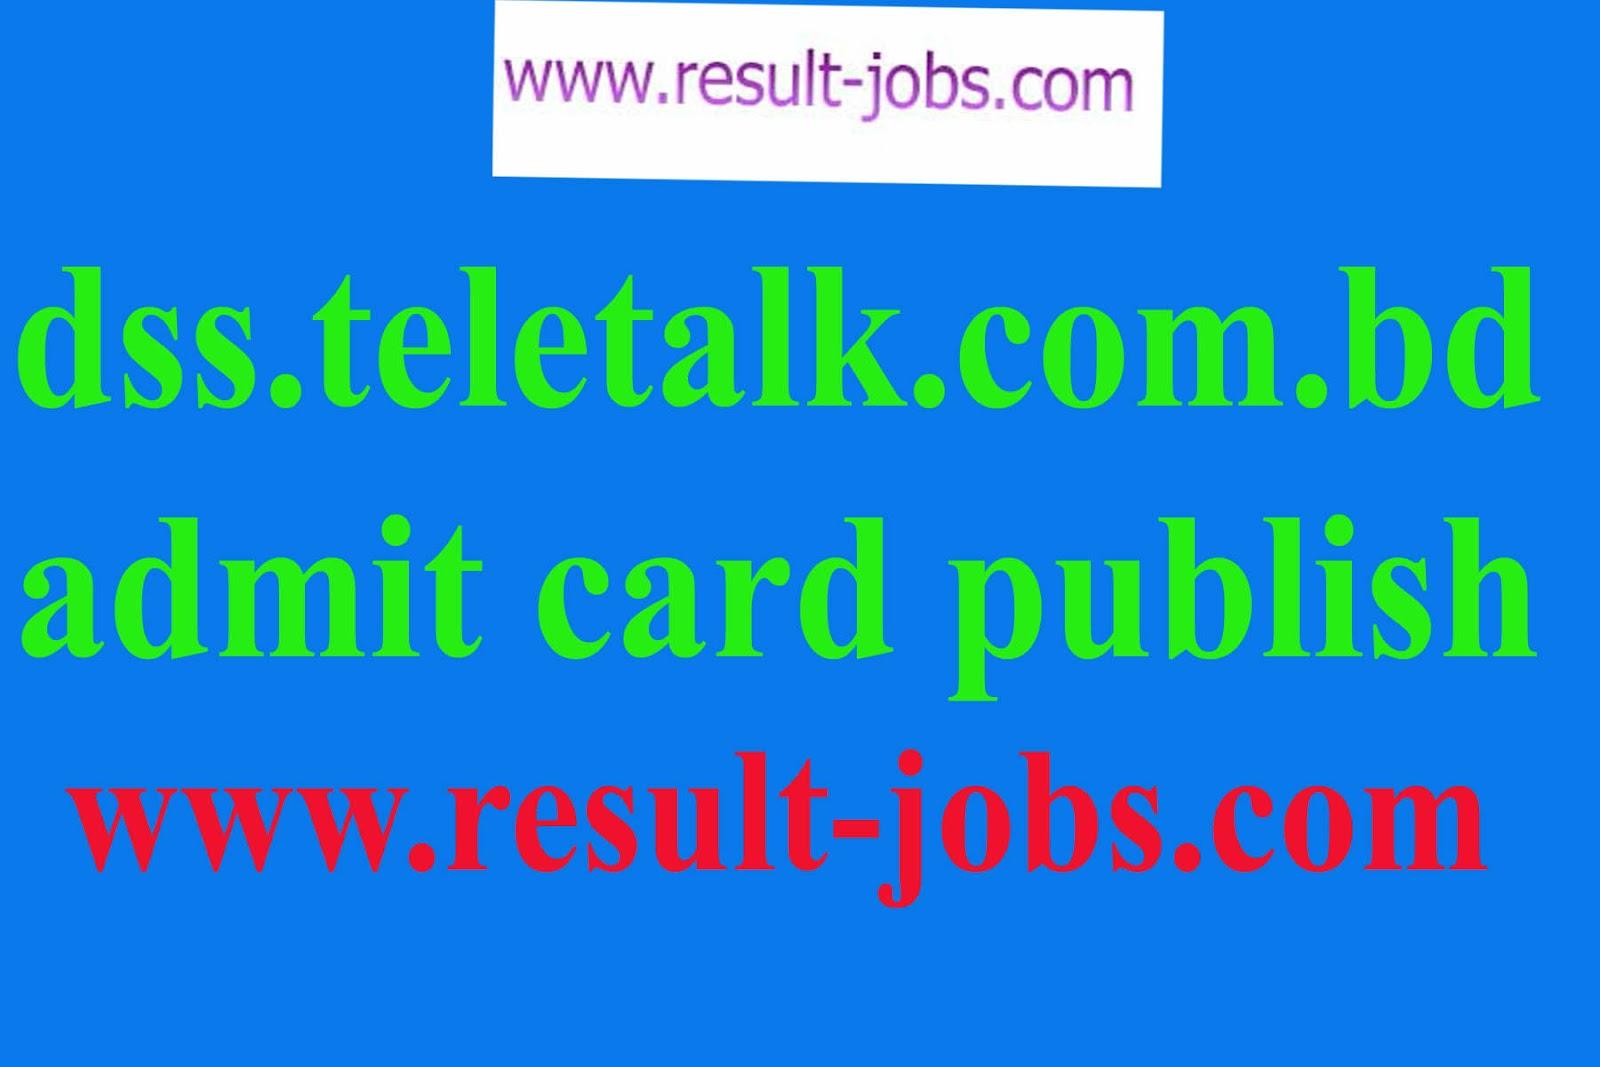 dss admit card download, admit card, dss admit card, dss admit card 2019